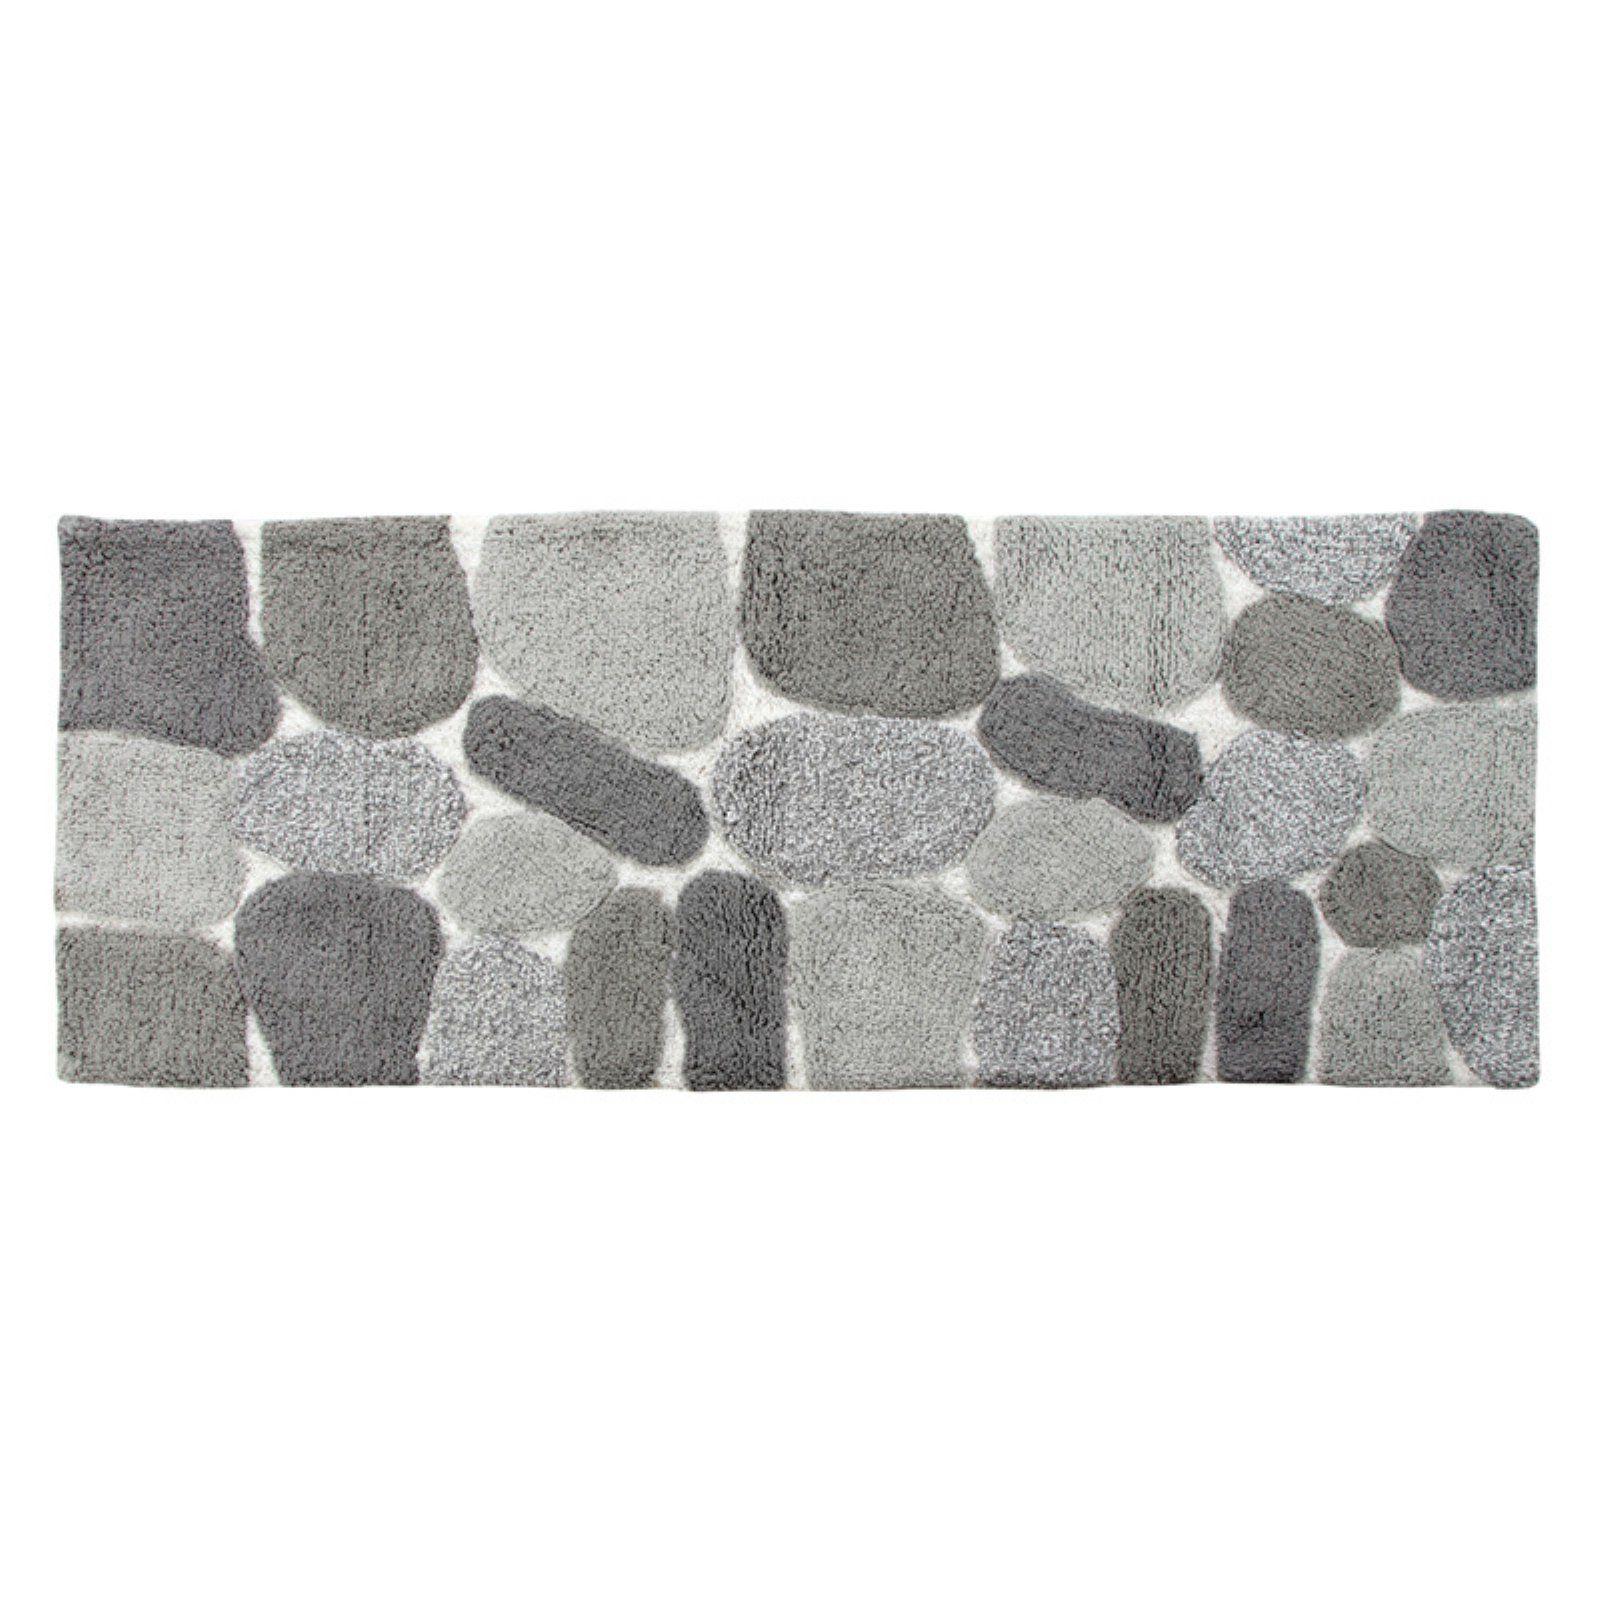 Chesapeake Pebbles Bath Rug Runner Grey